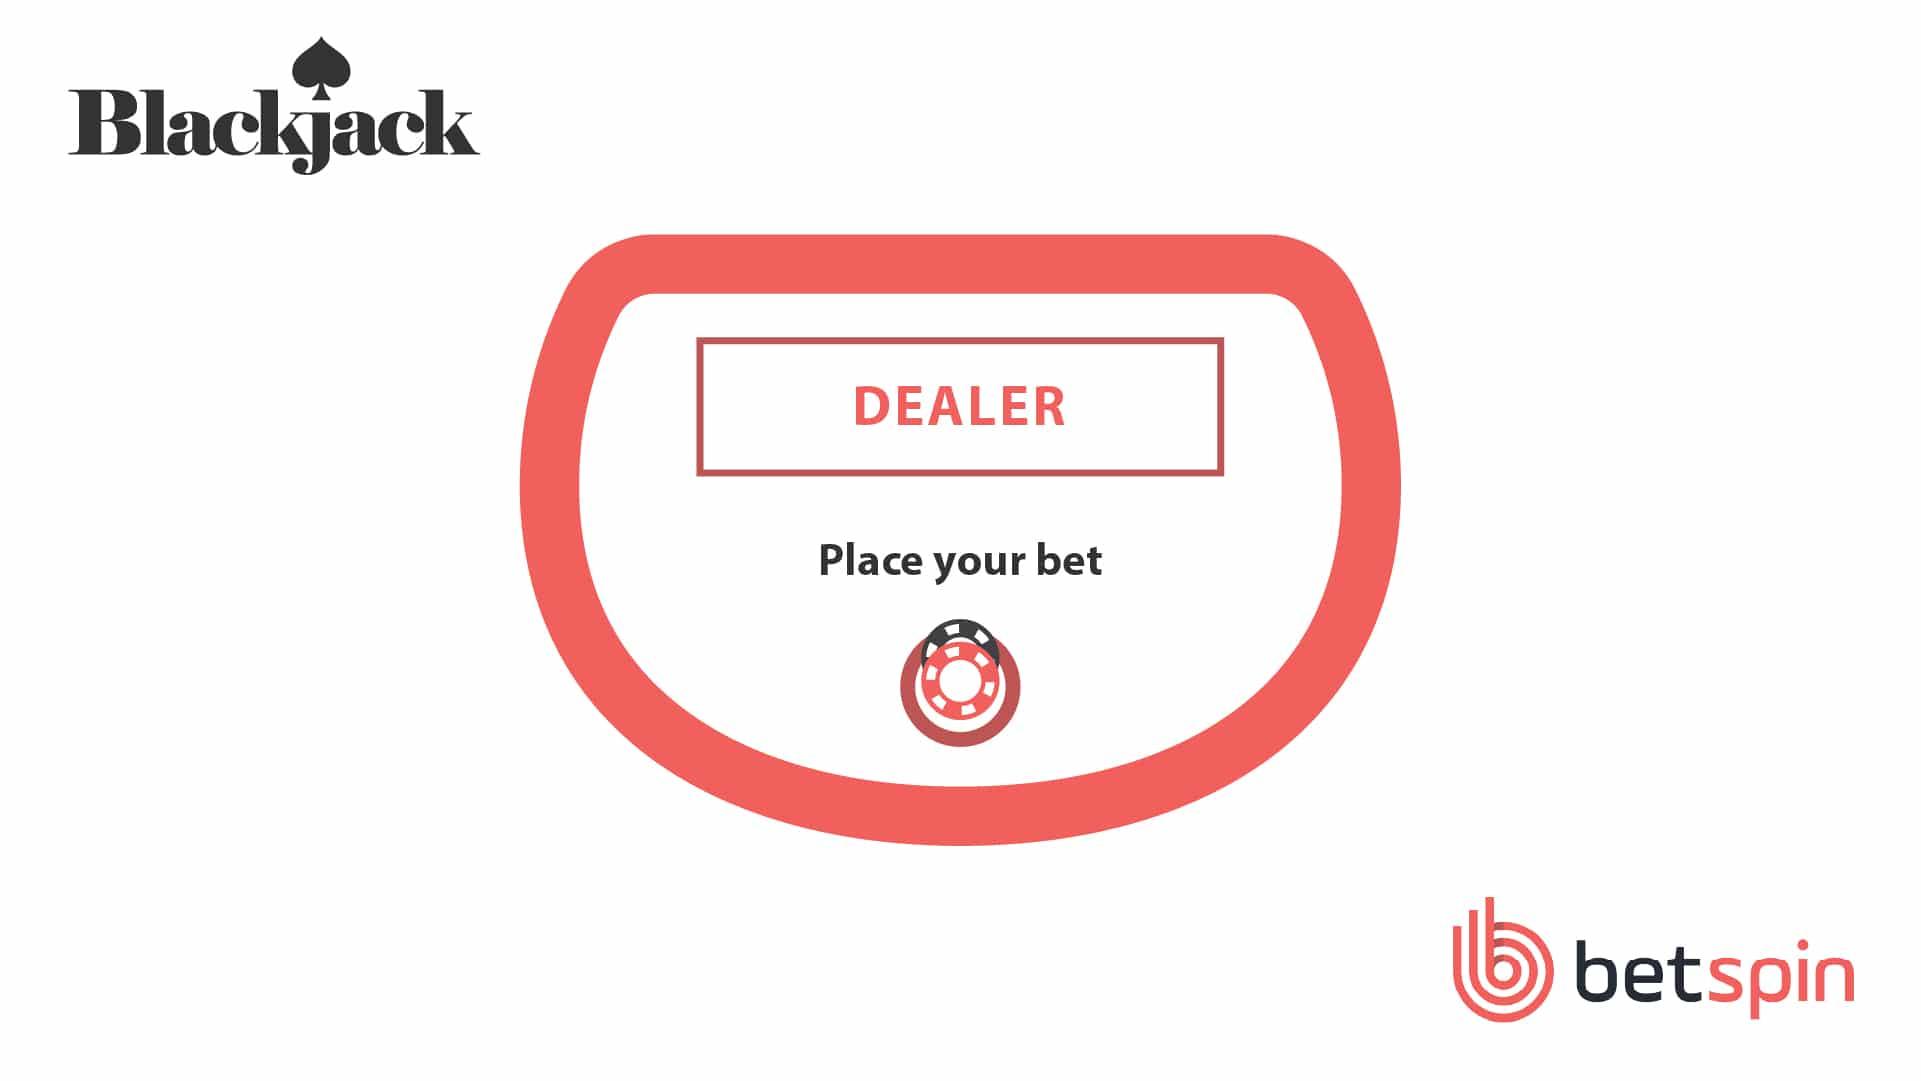 Blackjack Step 1